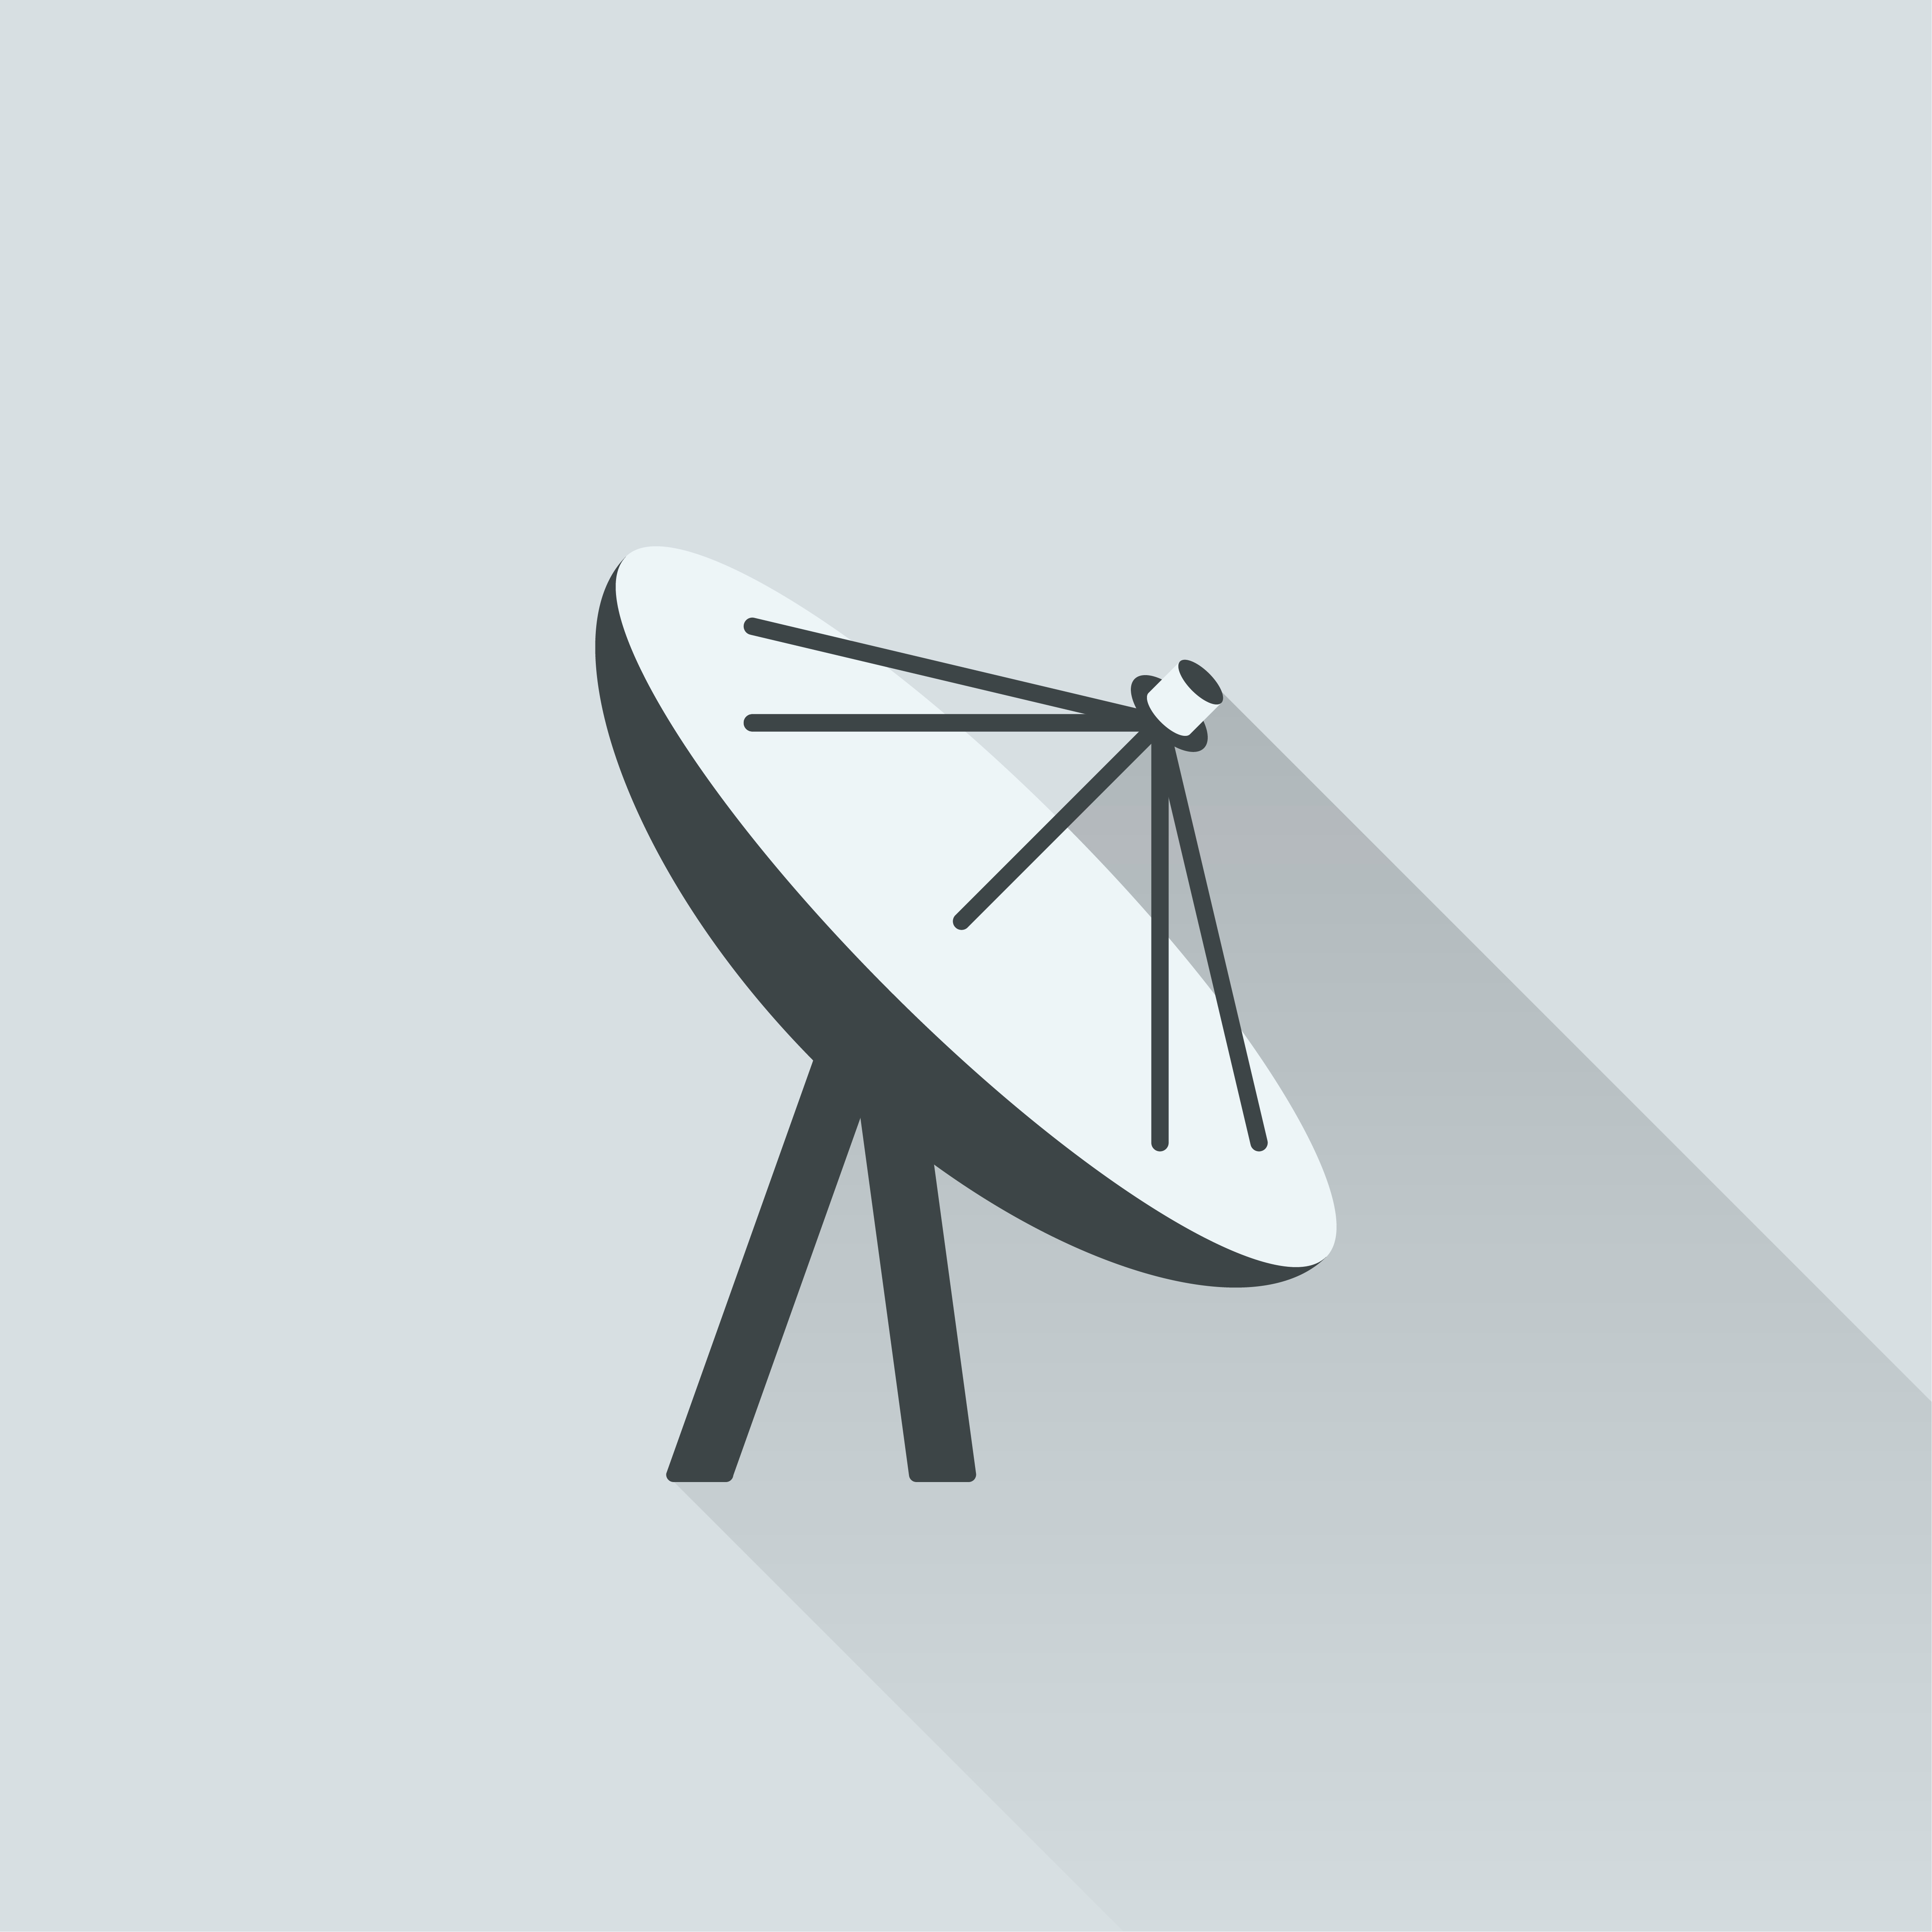 Illustration of satellite antenna